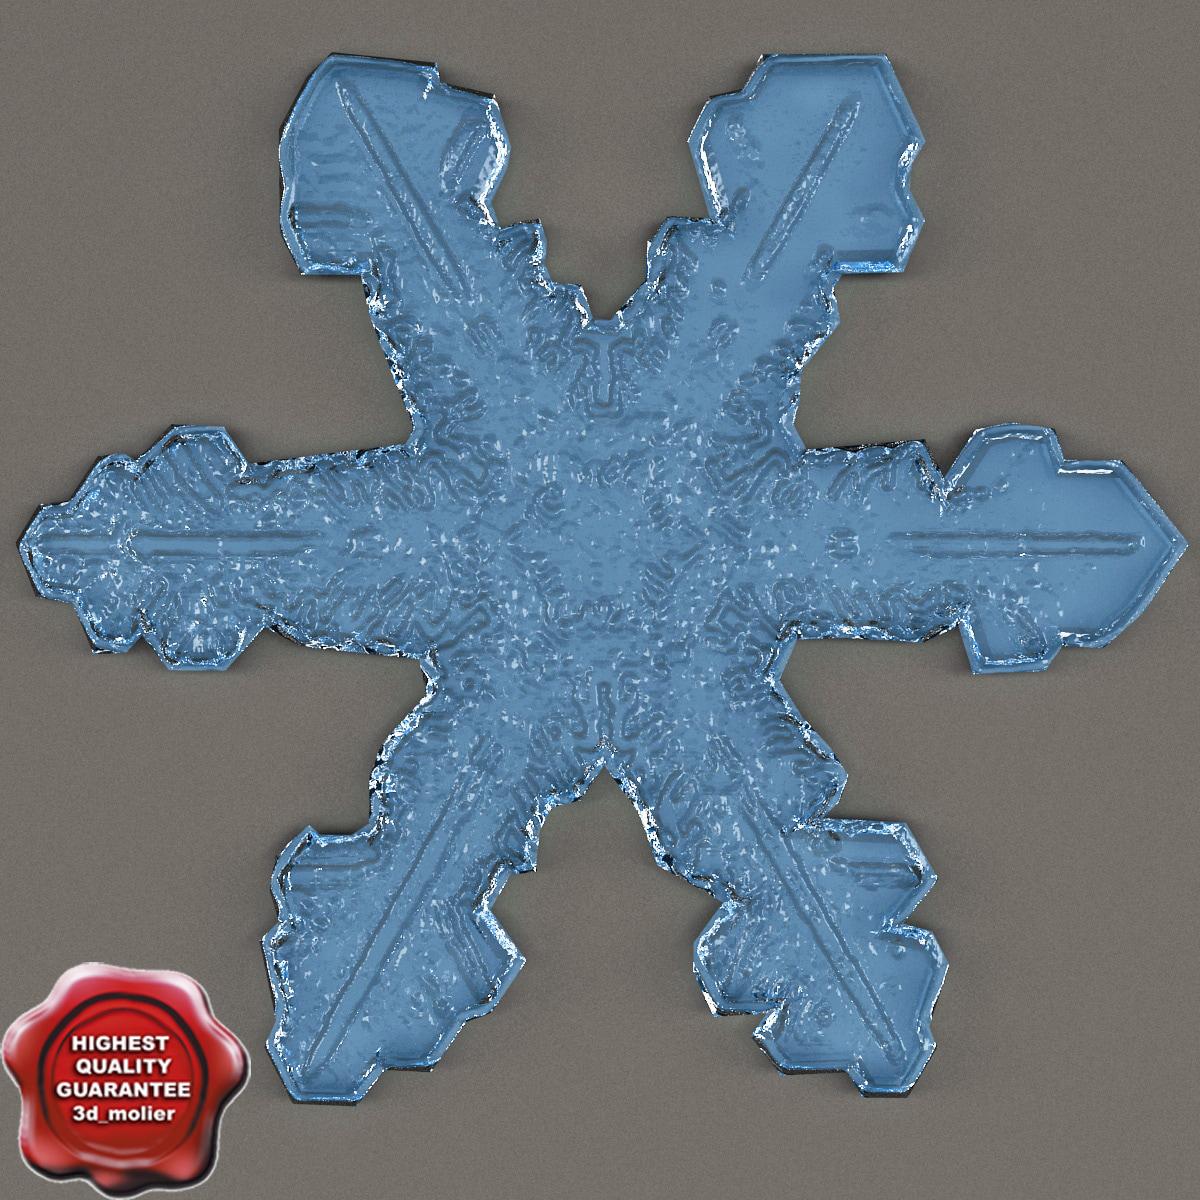 Snowflake_V4_0.jpg